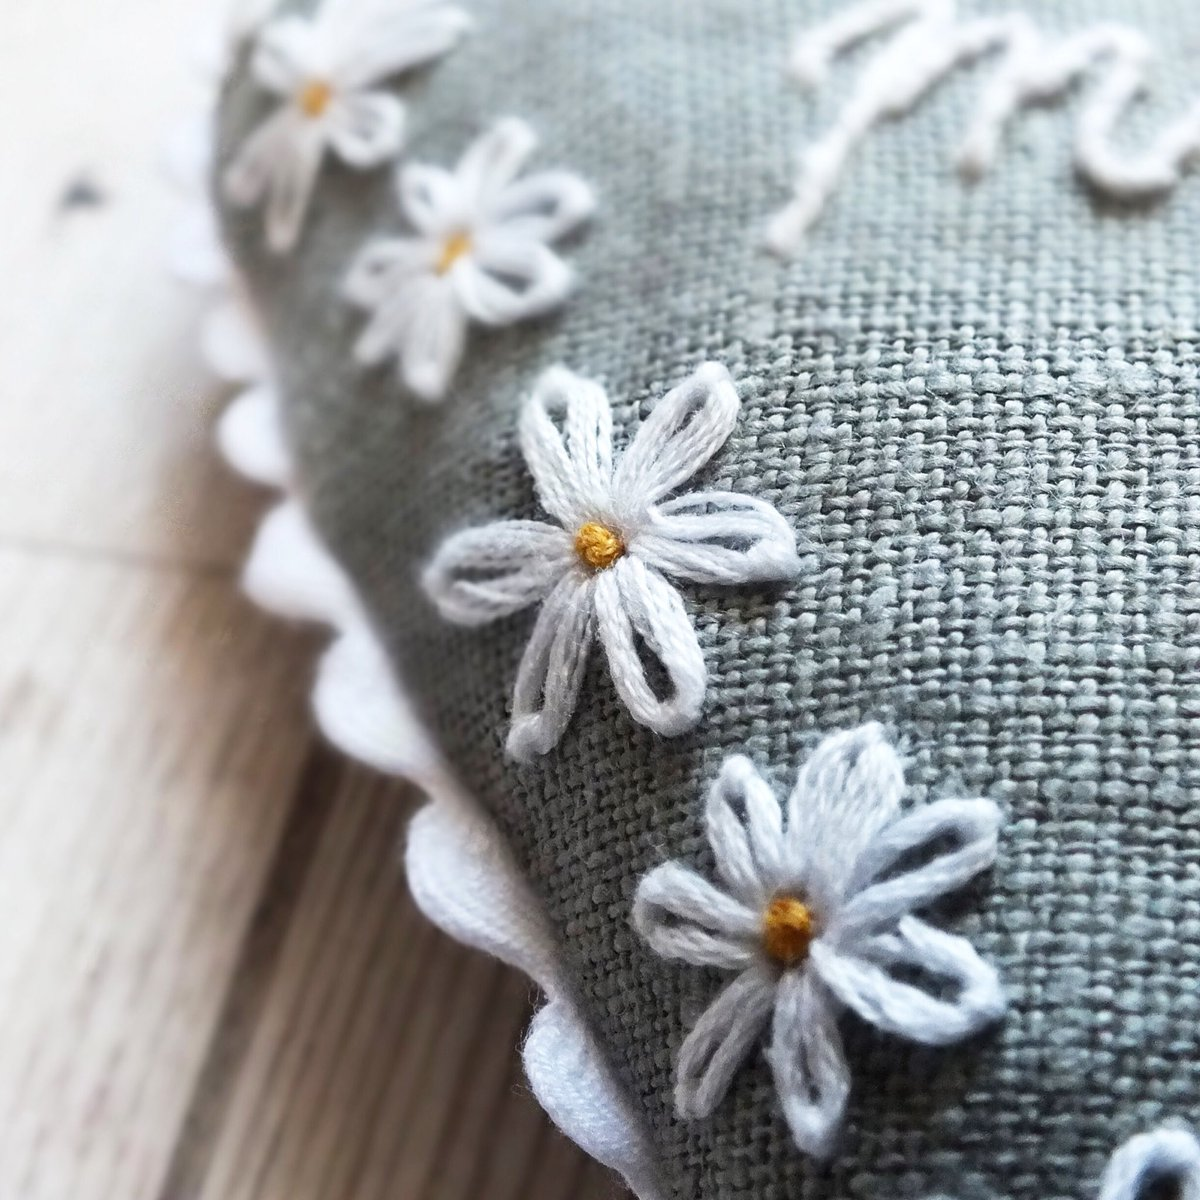 Hangingheart hashtag on twitter httpsetsyuklisting582418718embroidered daisy mum hanging heart home handmadeat103 daisy sun saturday weekend embroidery flowers izmirmasajfo